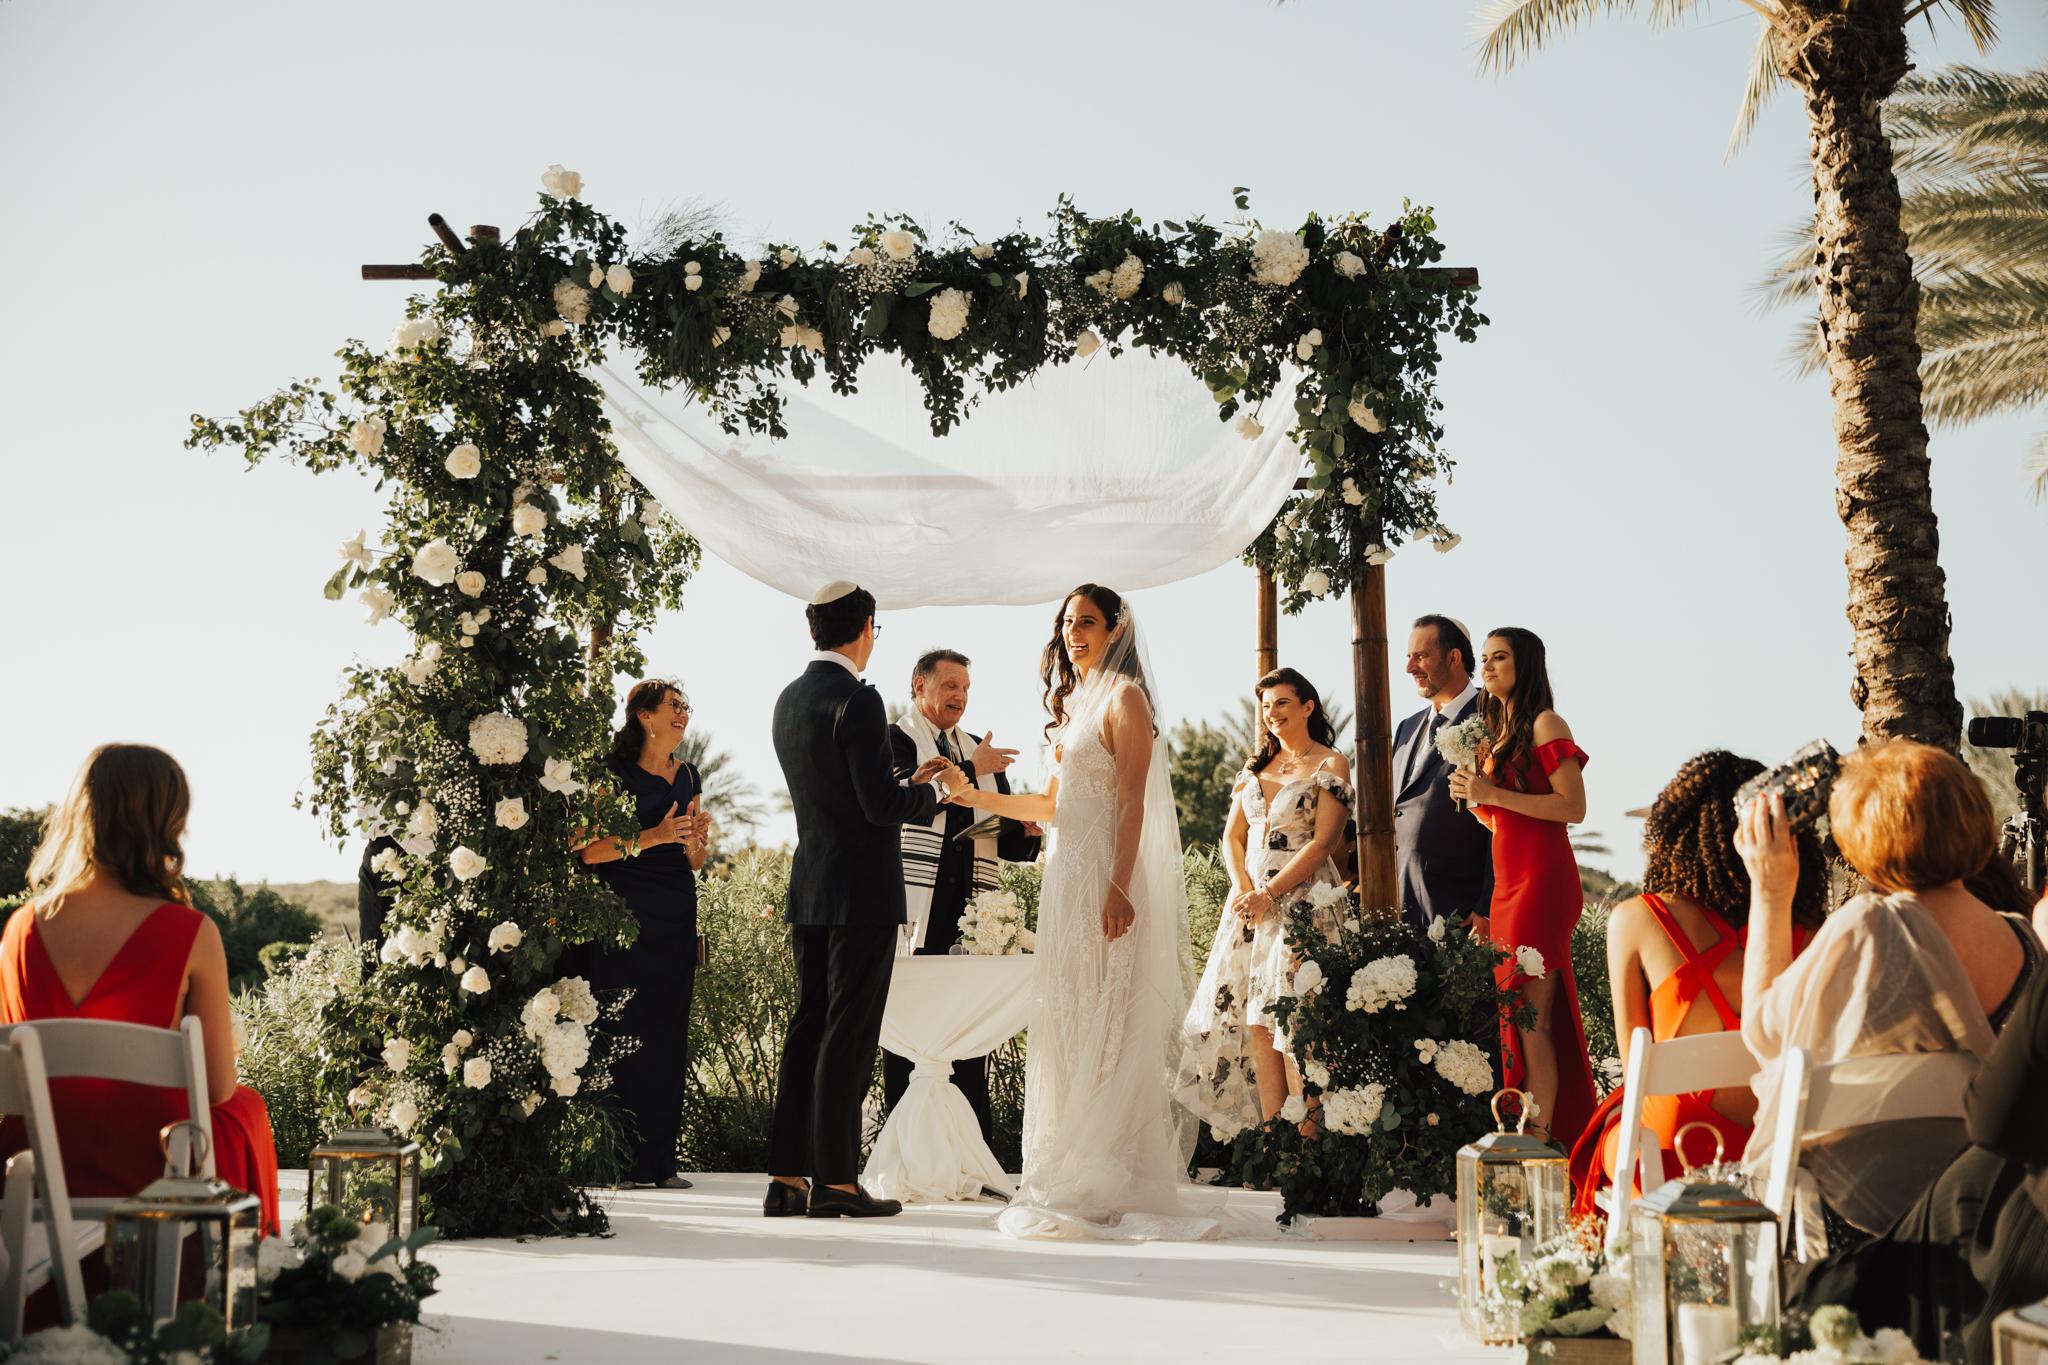 Intimate wedding in Caribbean